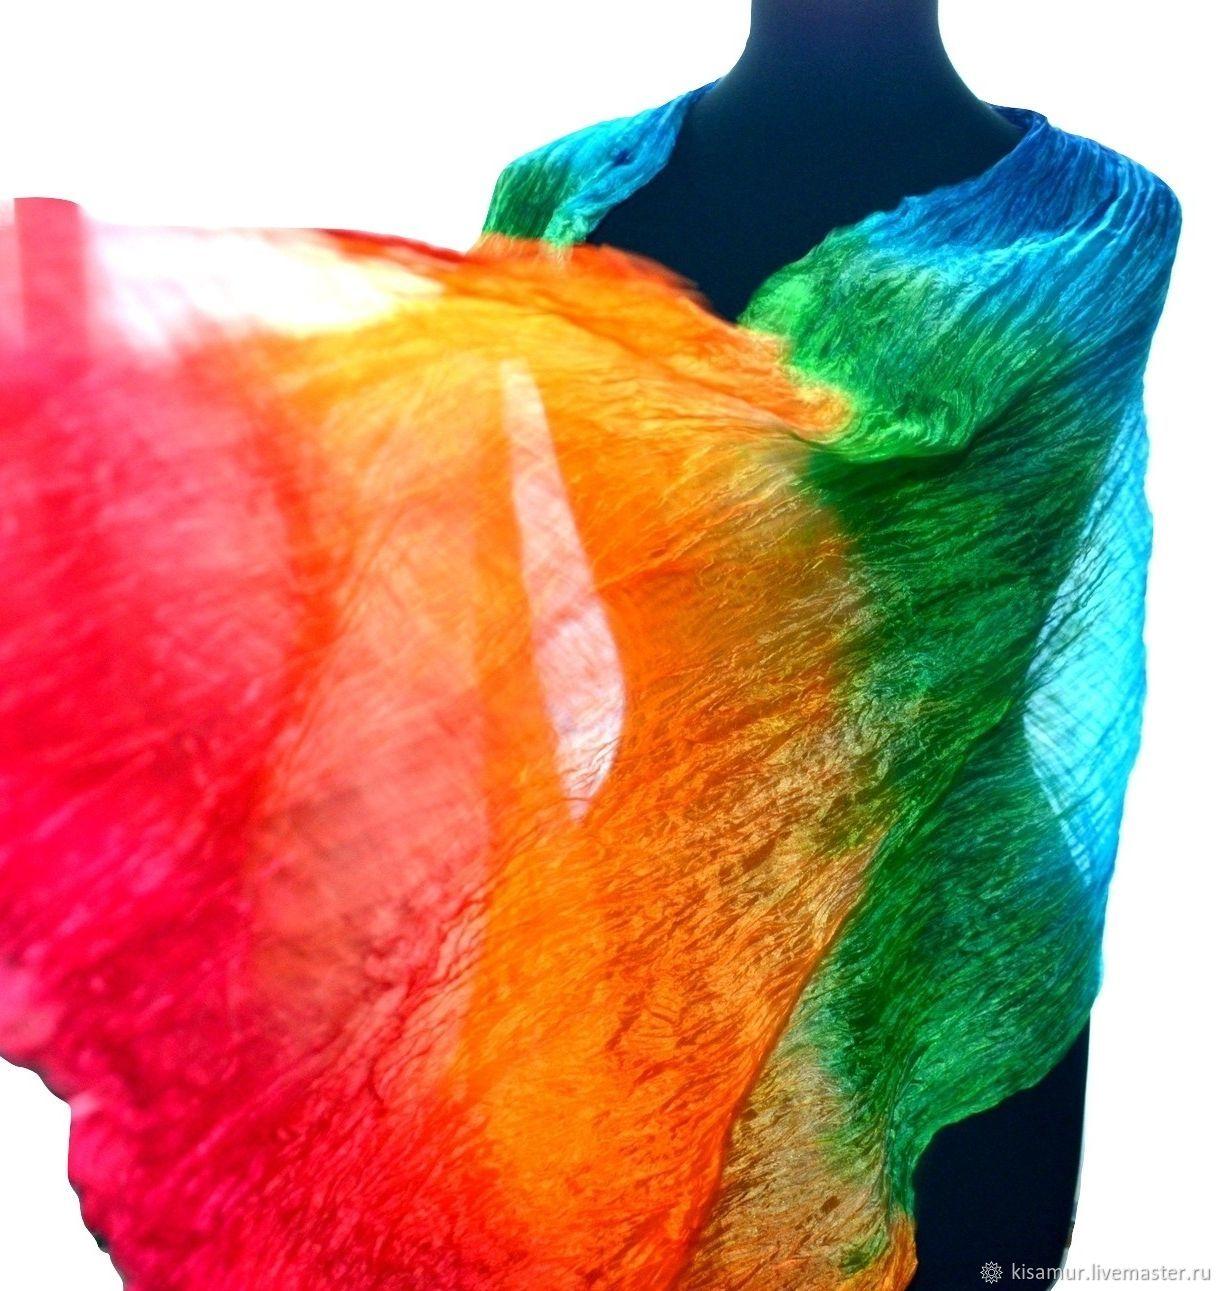 Livemaster - handmade. Buy the women s silk scarf rainbow colors rainbow  bright ... 6daf41a0c